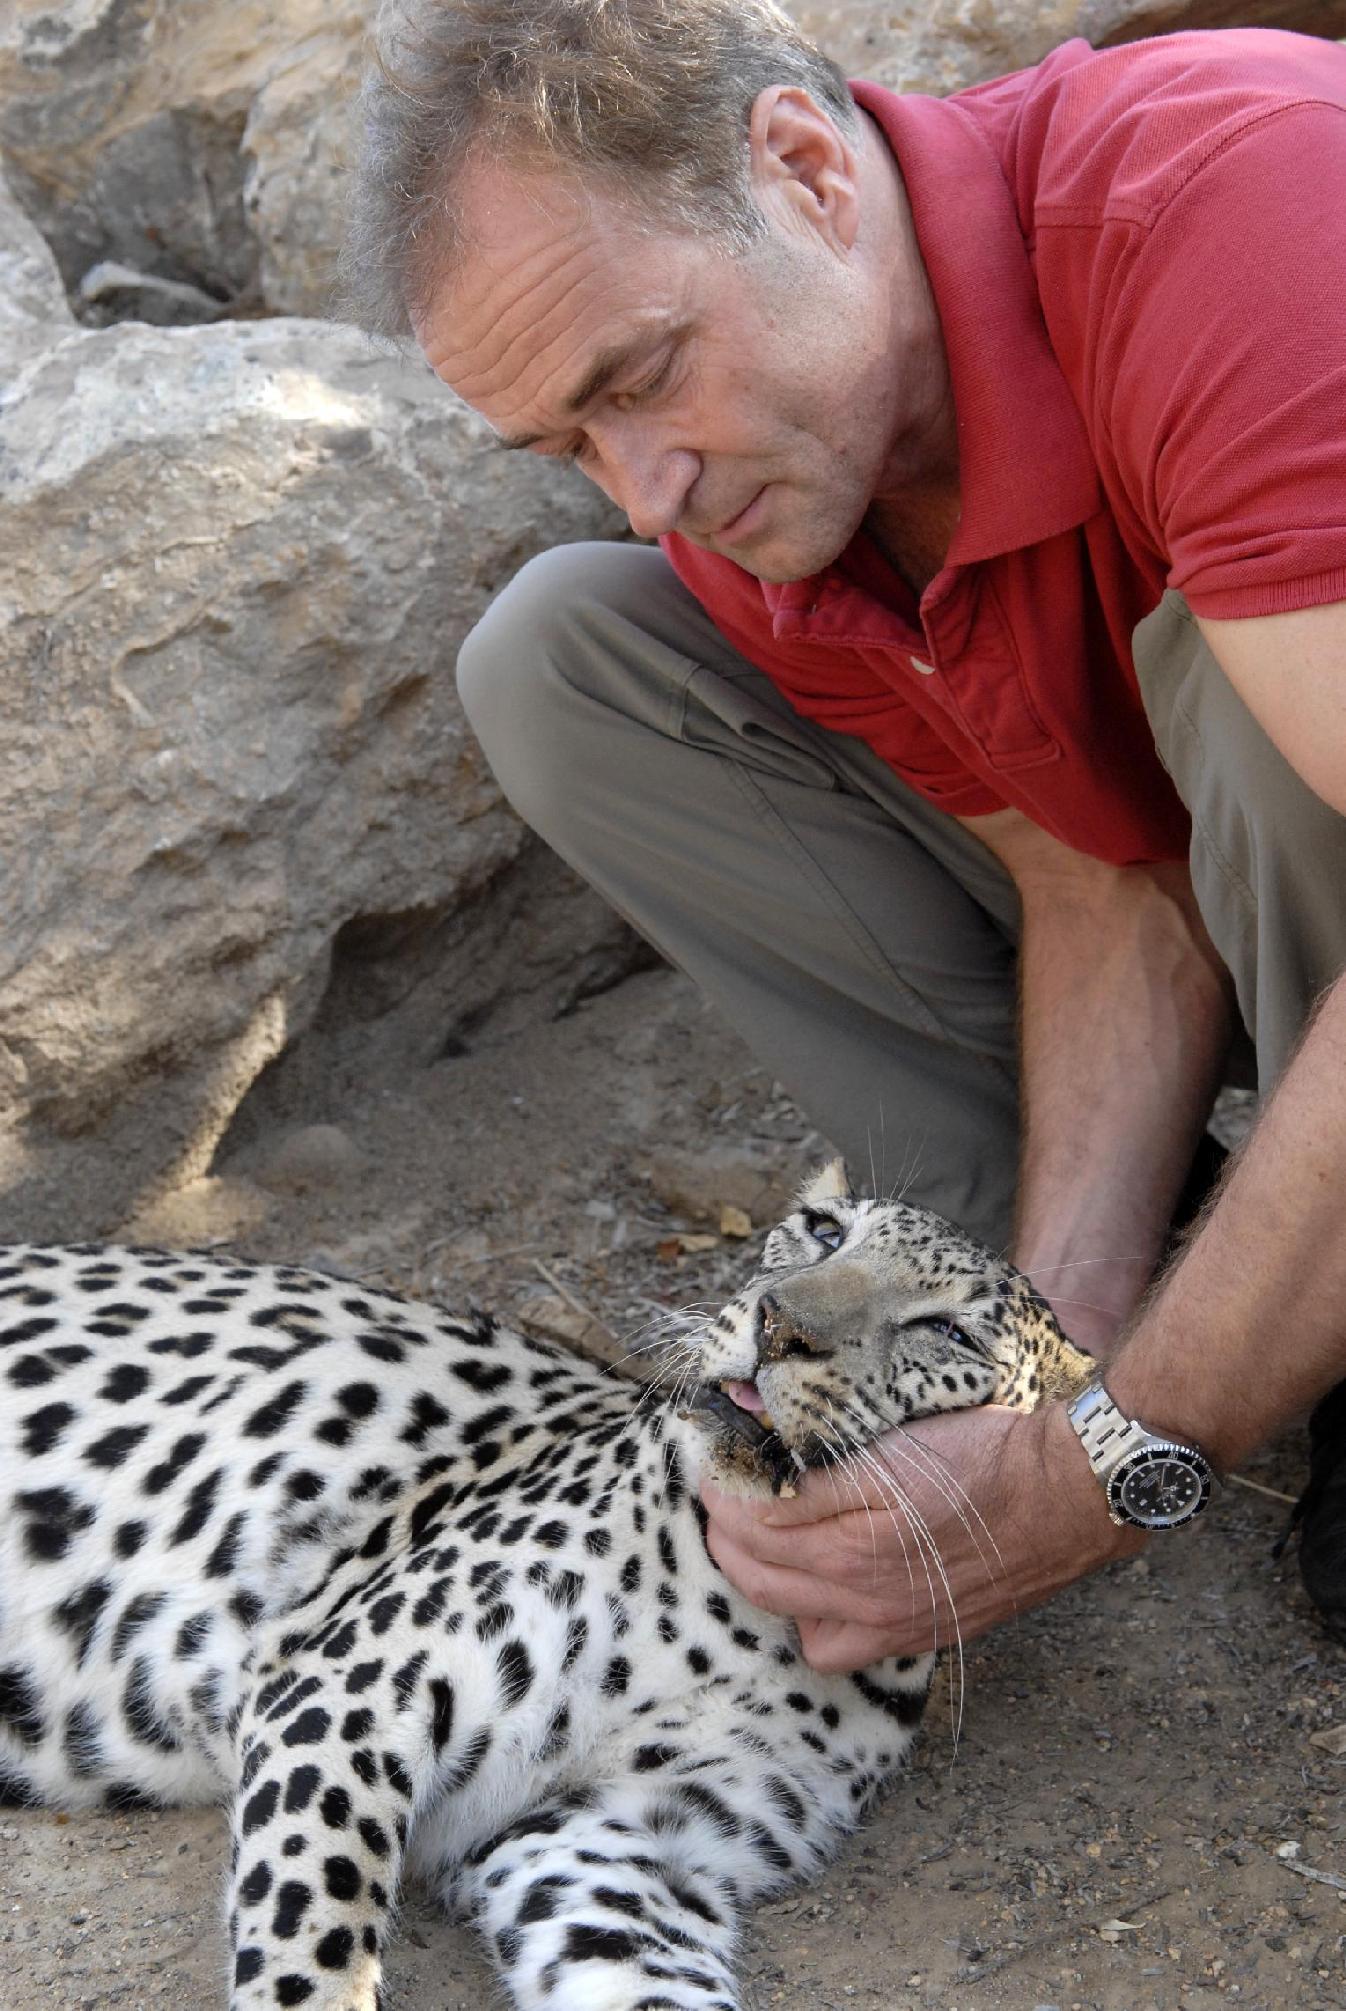 femea leopardo vs macho leopardo nebuloso Rolex-awards-winner-rory-wilson-removes-tracking-collar-from-arabian-leopard